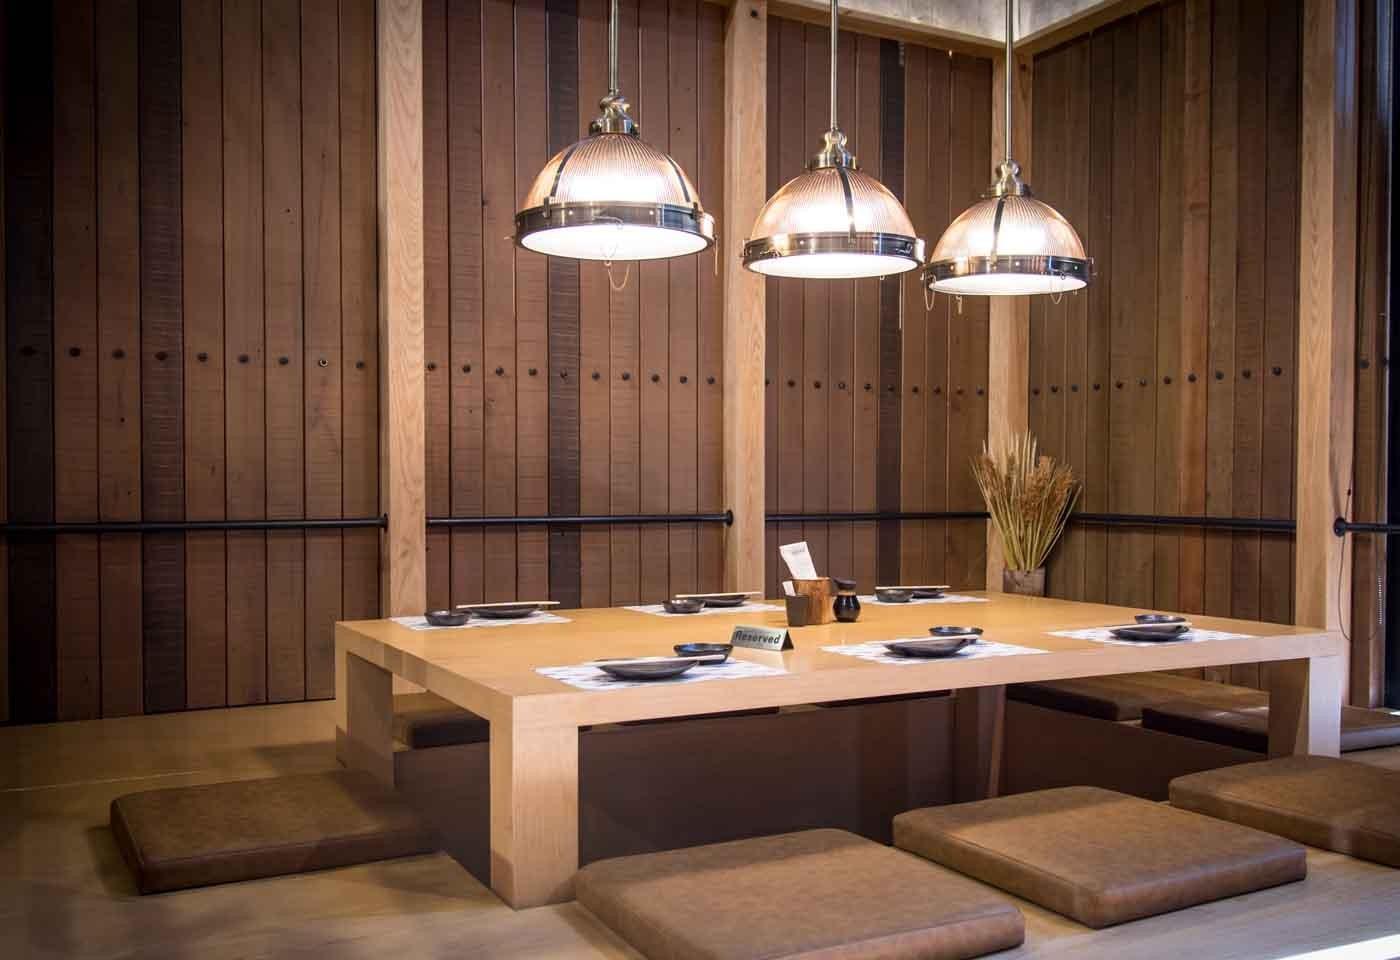 Mangiare Seduti A Un Tavolo Oppure Seduti Per Terra  2021